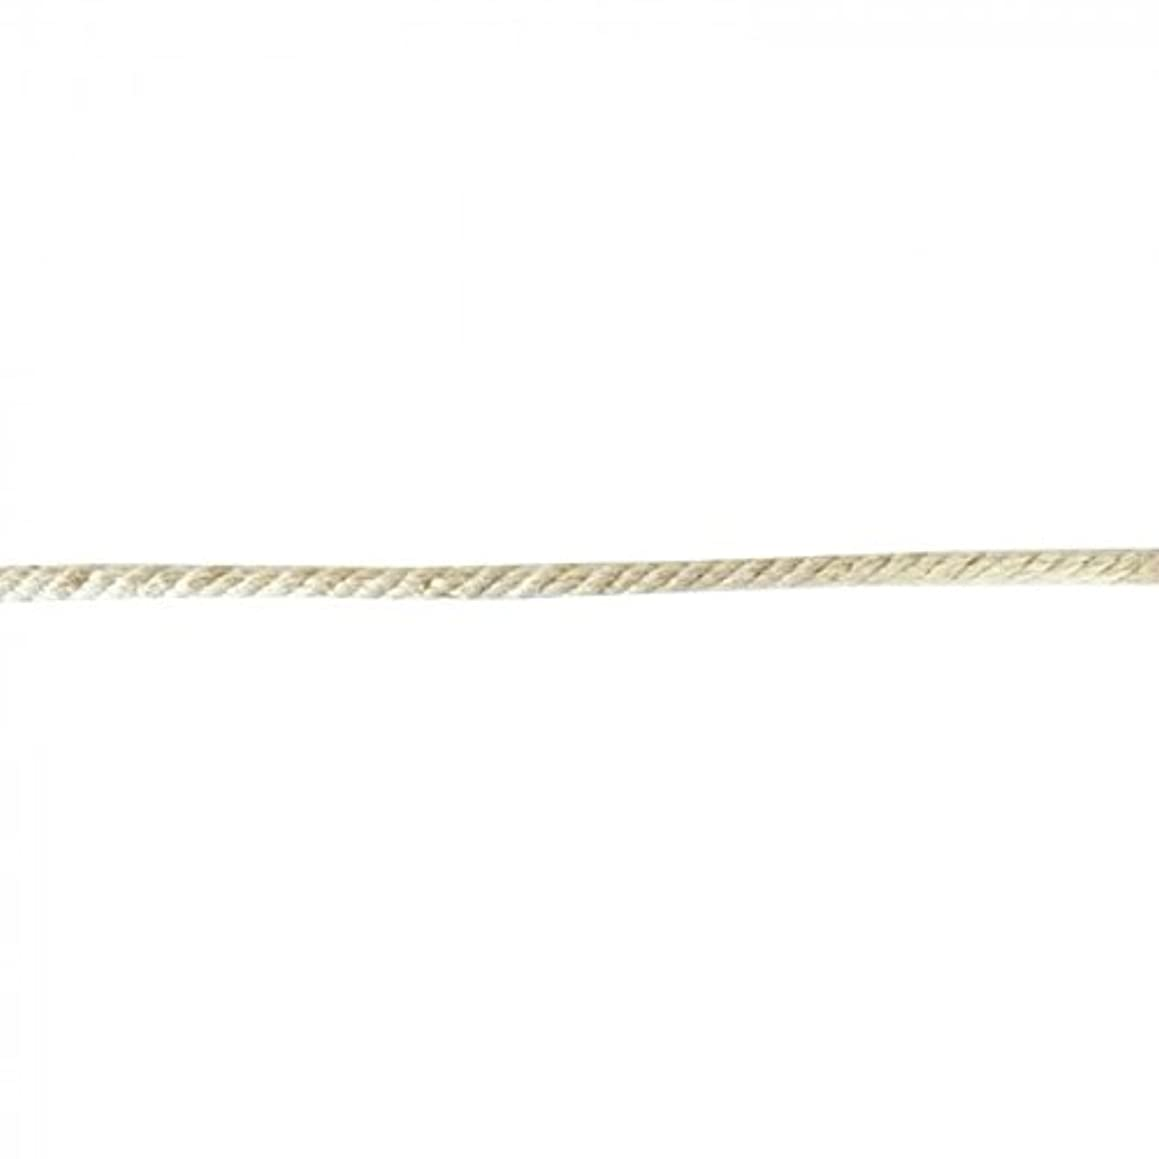 Vaessen Creative Cotton Line Cord, Natural, One Size